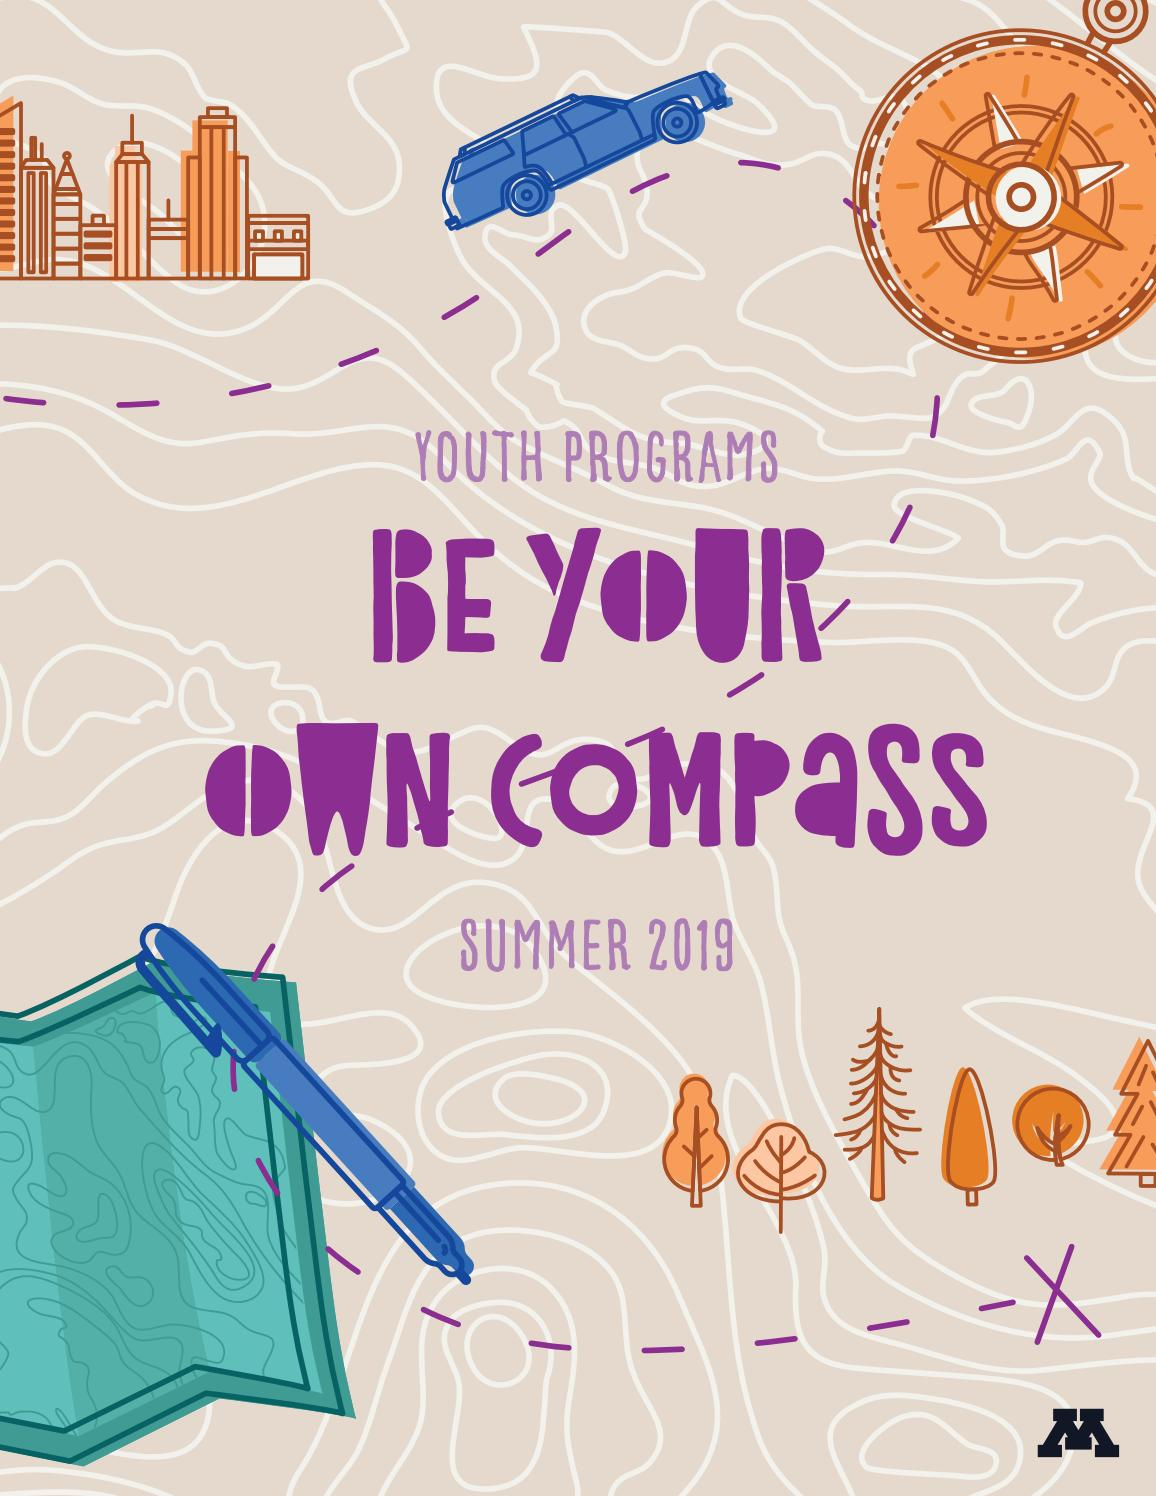 Umn Academic Calendar.Be Your Own Compass Umn Youth Programs Summer Camp 2019 By